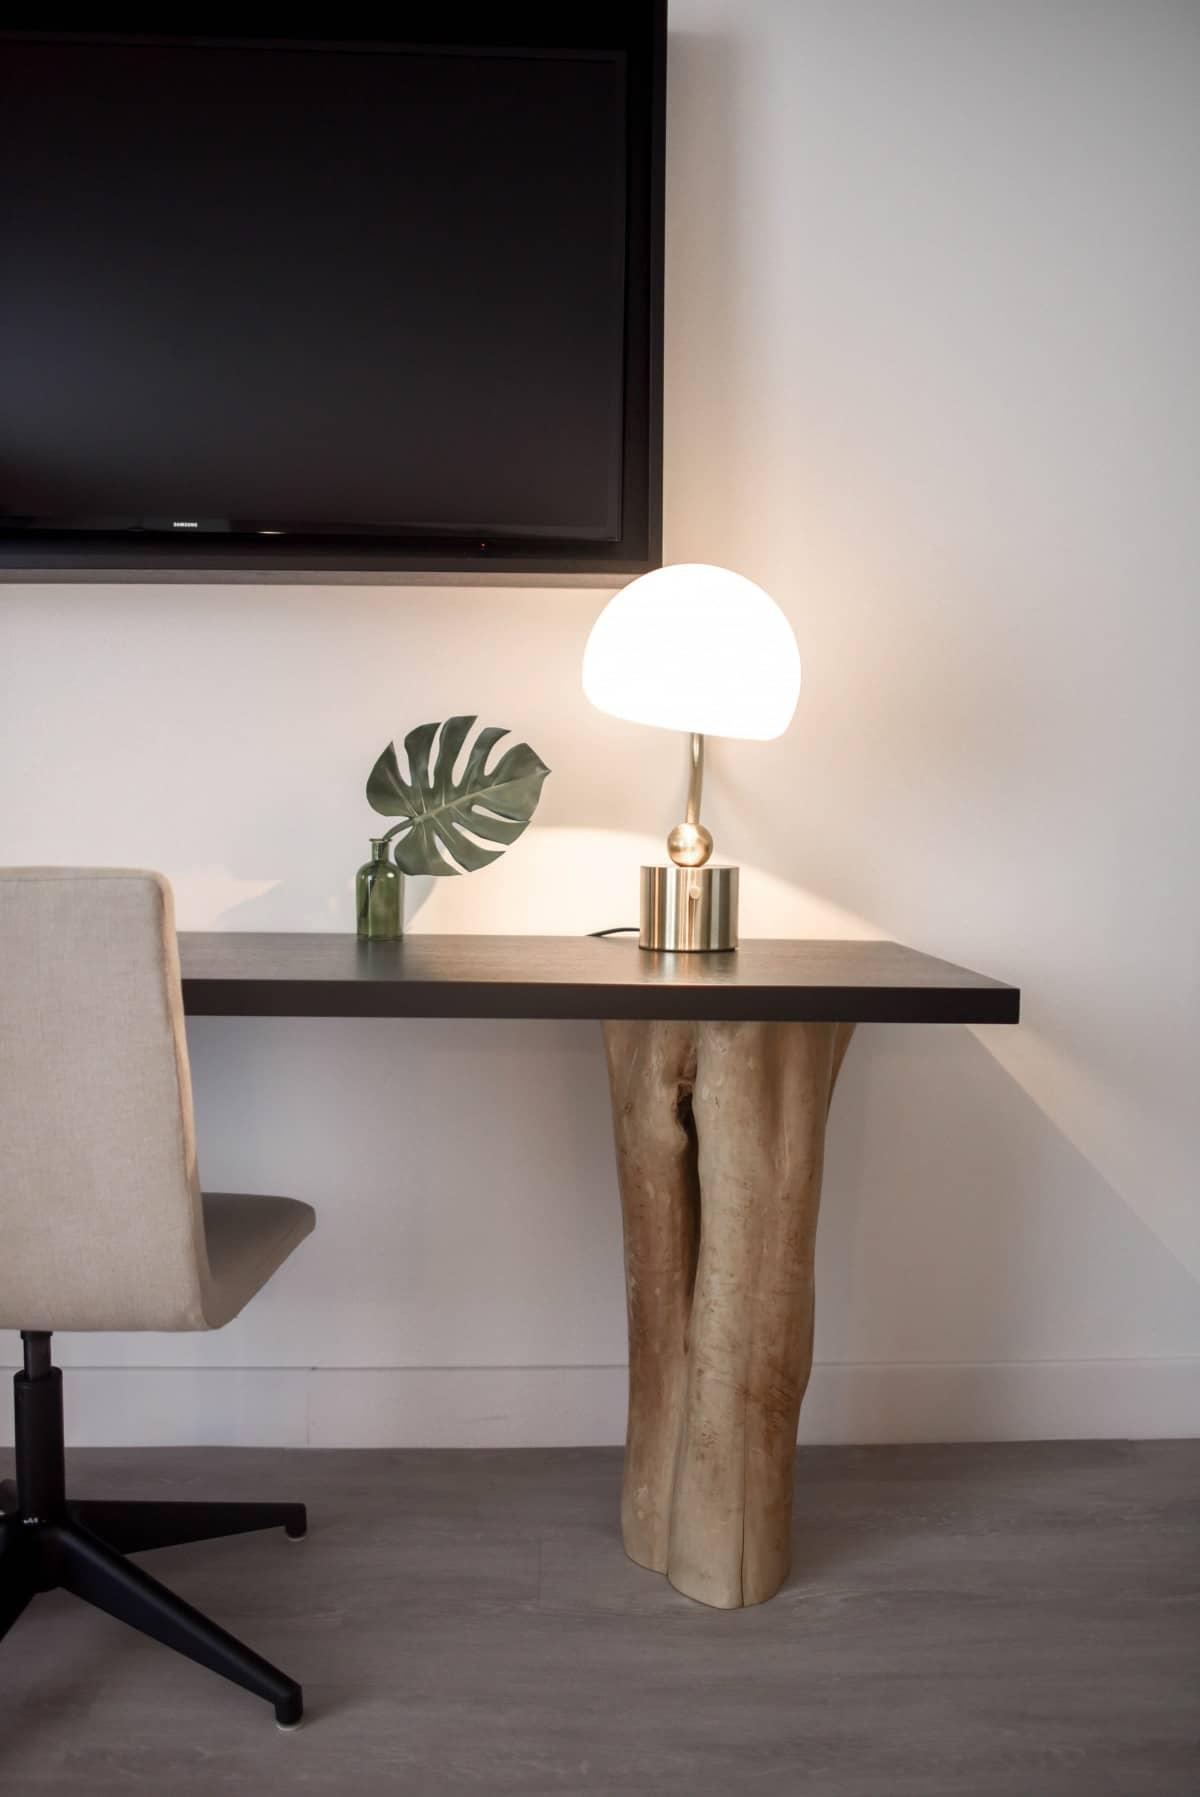 Comment bien choisir ses luminairesdesign ?